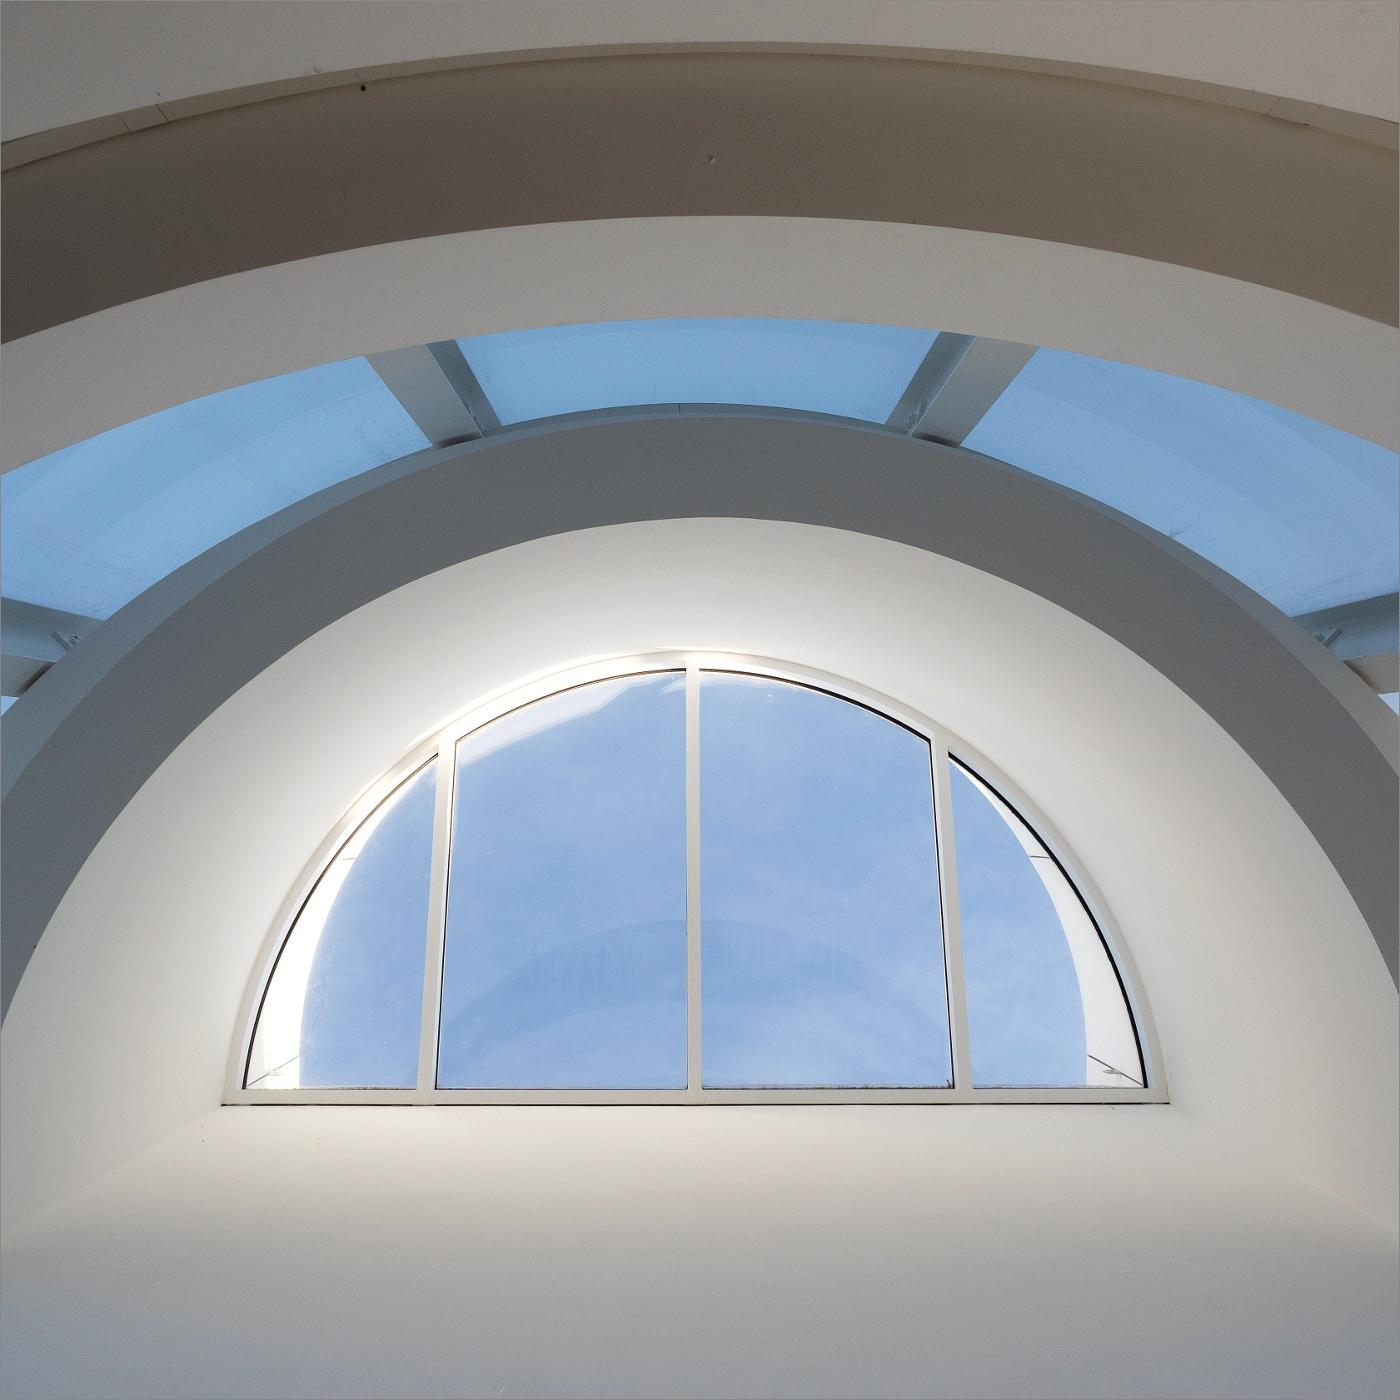 Arp Museum | Blick nach oben | © wolfgang röser | worobo